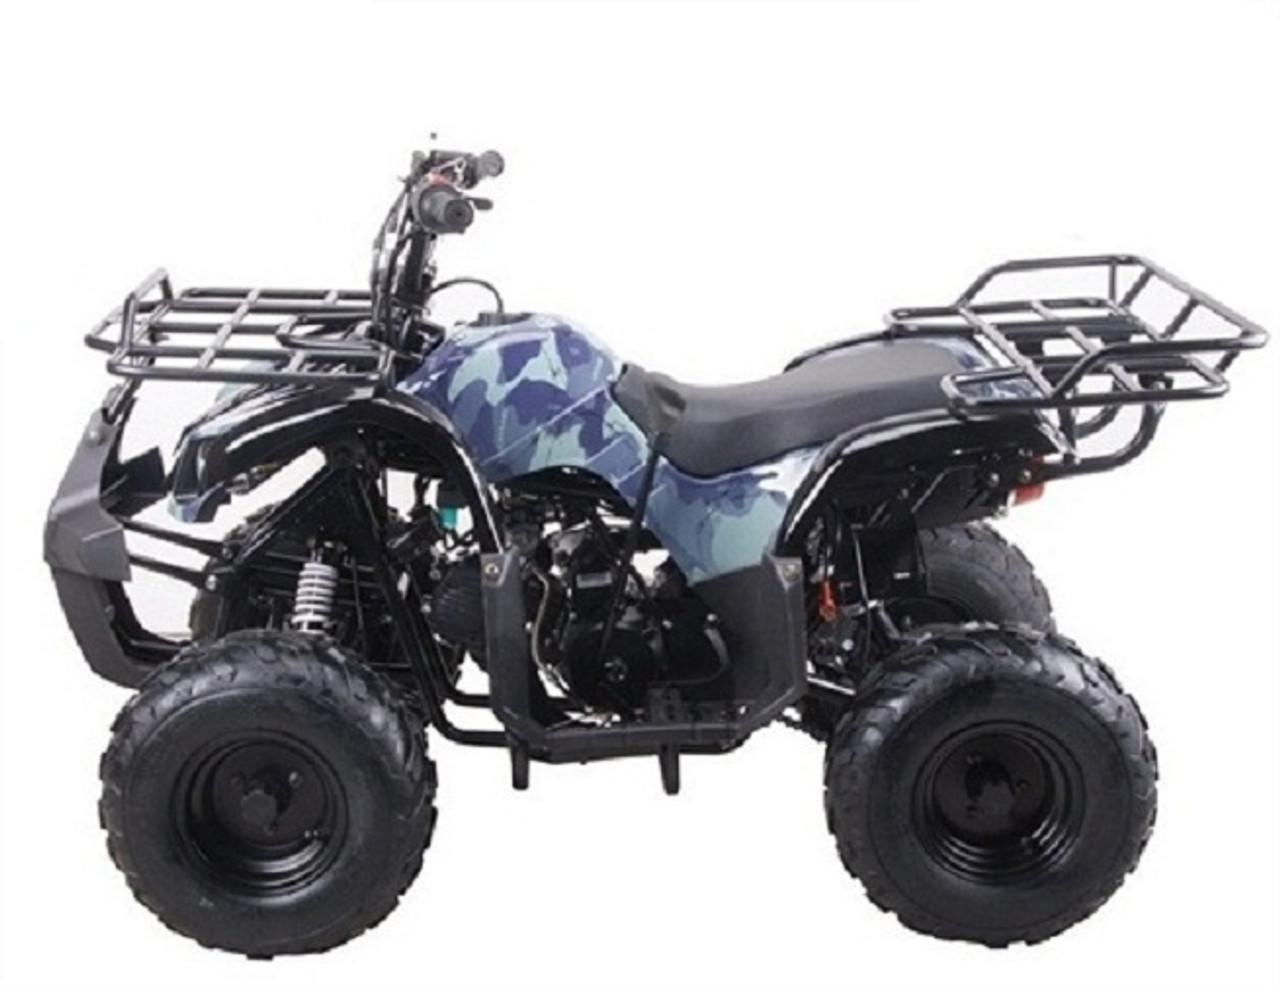 "Coolster ATV-3125R KODIAK-HD 125CC ATV with REVERSE Big 16"" Tire, 125CC Single Cylinder, 4-Stroke, Air-Cooled"